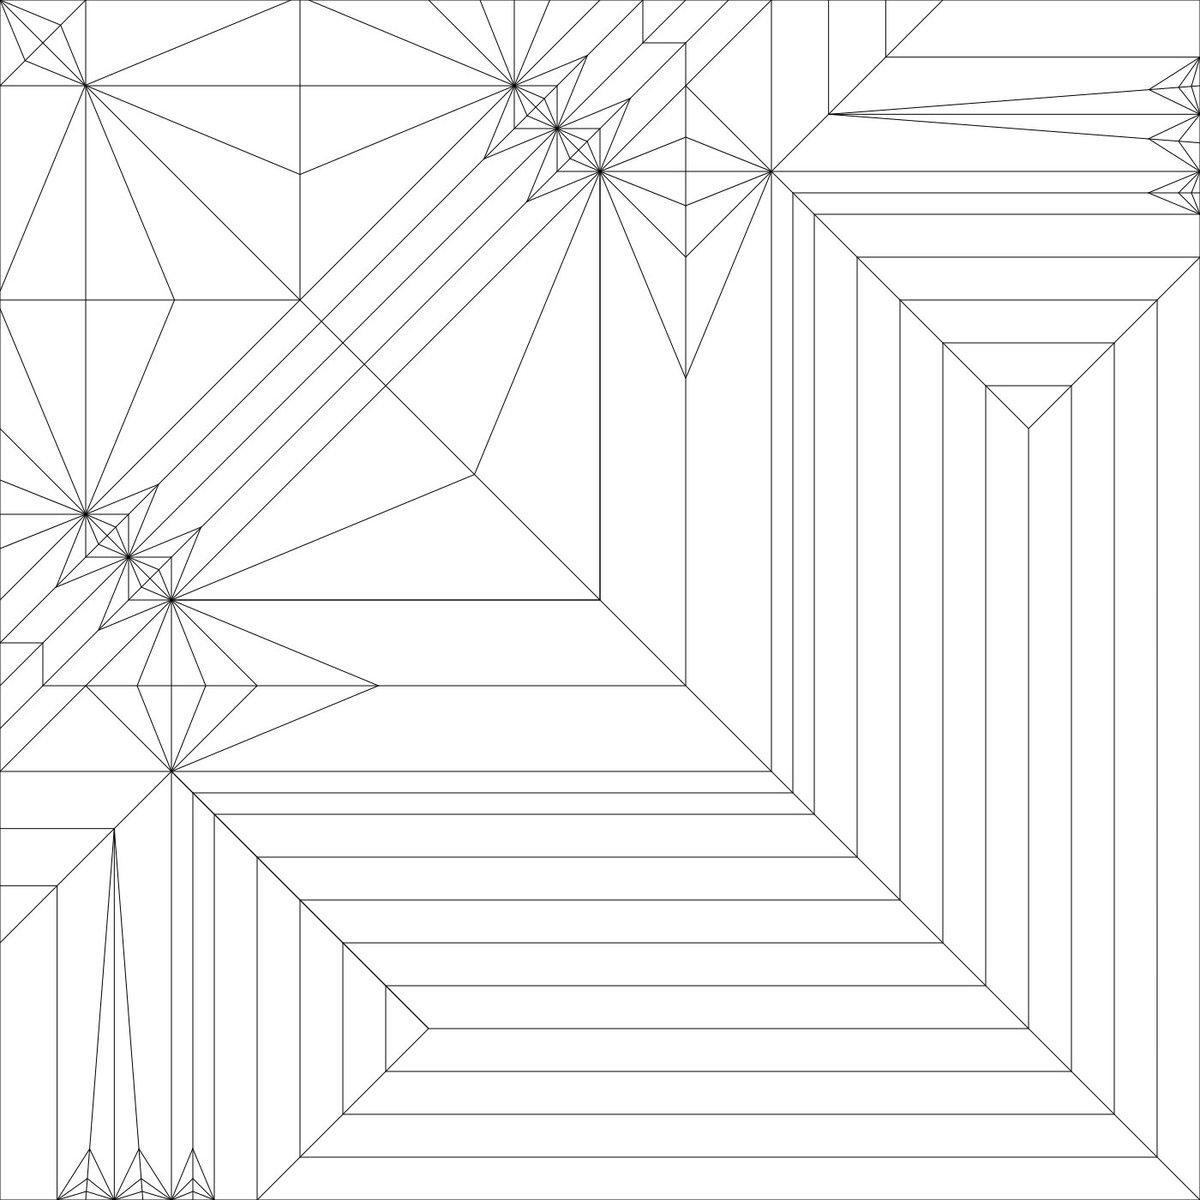 Origami | Origami diagrams, Origami and kirigami, Origami paper art | 1200x1200